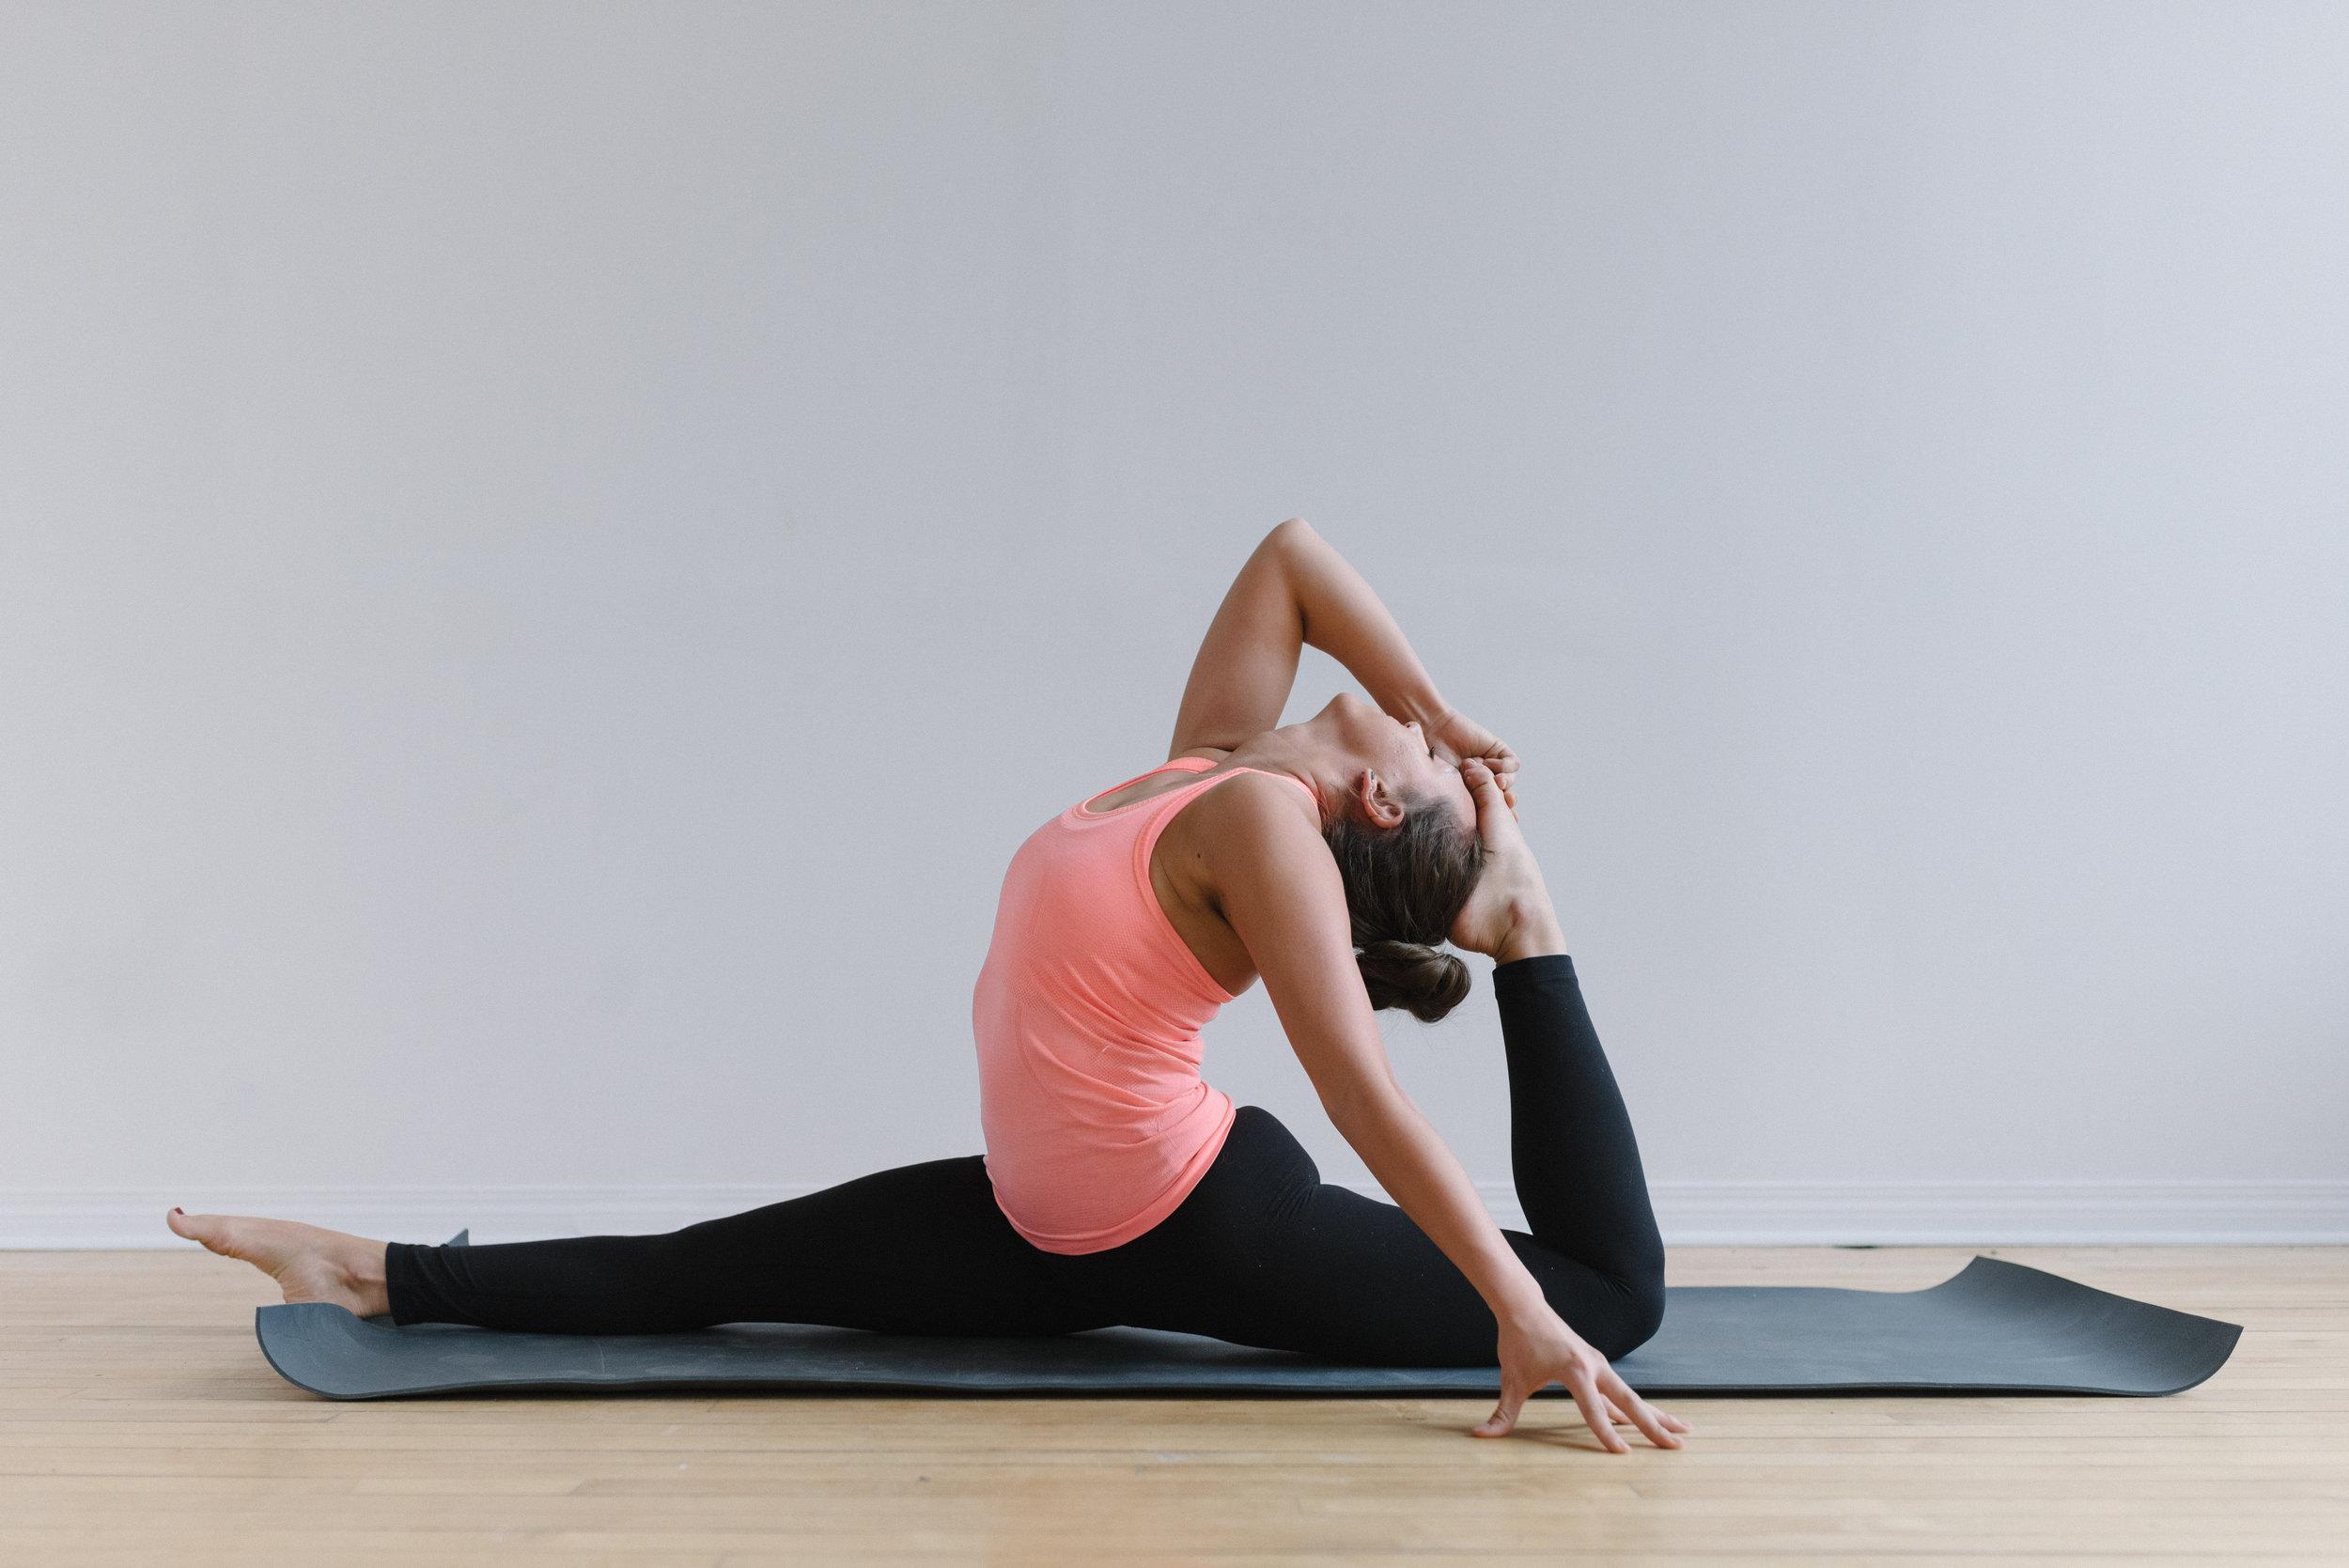 Sam+D+Squire+_+Yoga+_+Meditation+_+Splits+_+Yoga+Pose+_+Yoga+Sequence+_+At-Home+Yoga (11).jpeg